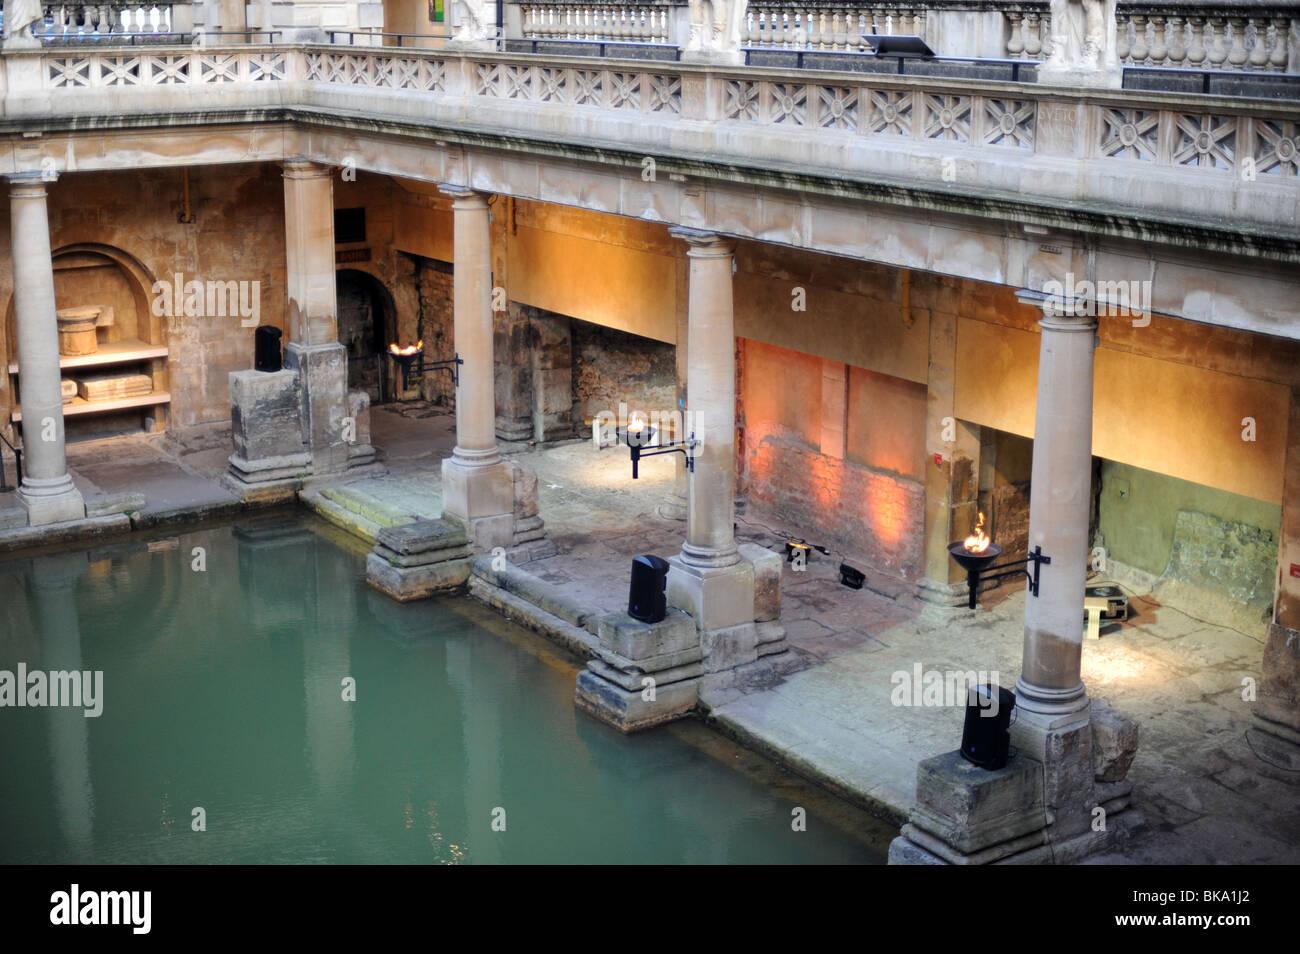 The Roman Baths, Bath - Stock Image